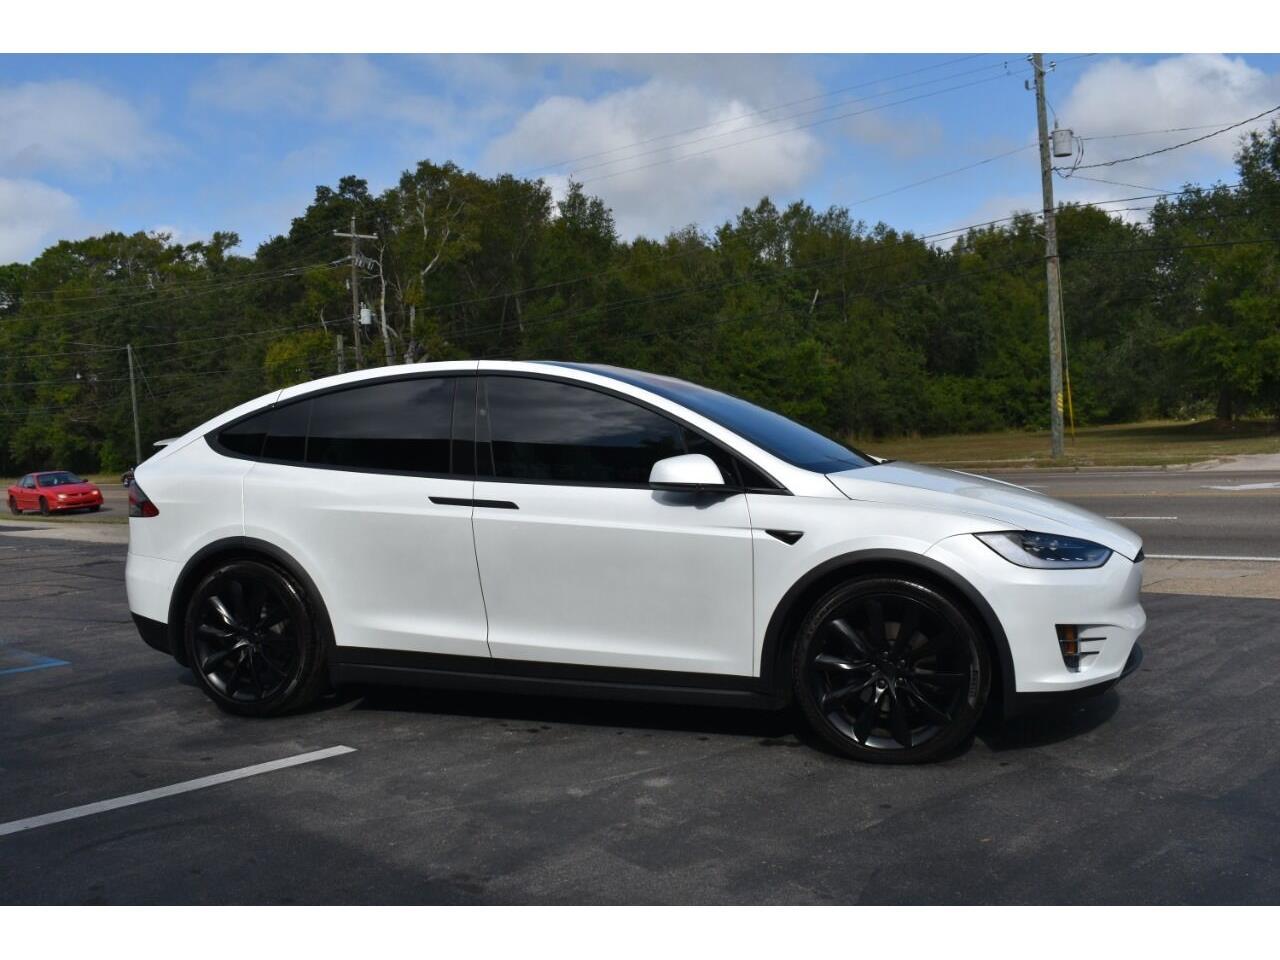 2019 Tesla Model X (CC-1416466) for sale in Biloxi, Mississippi